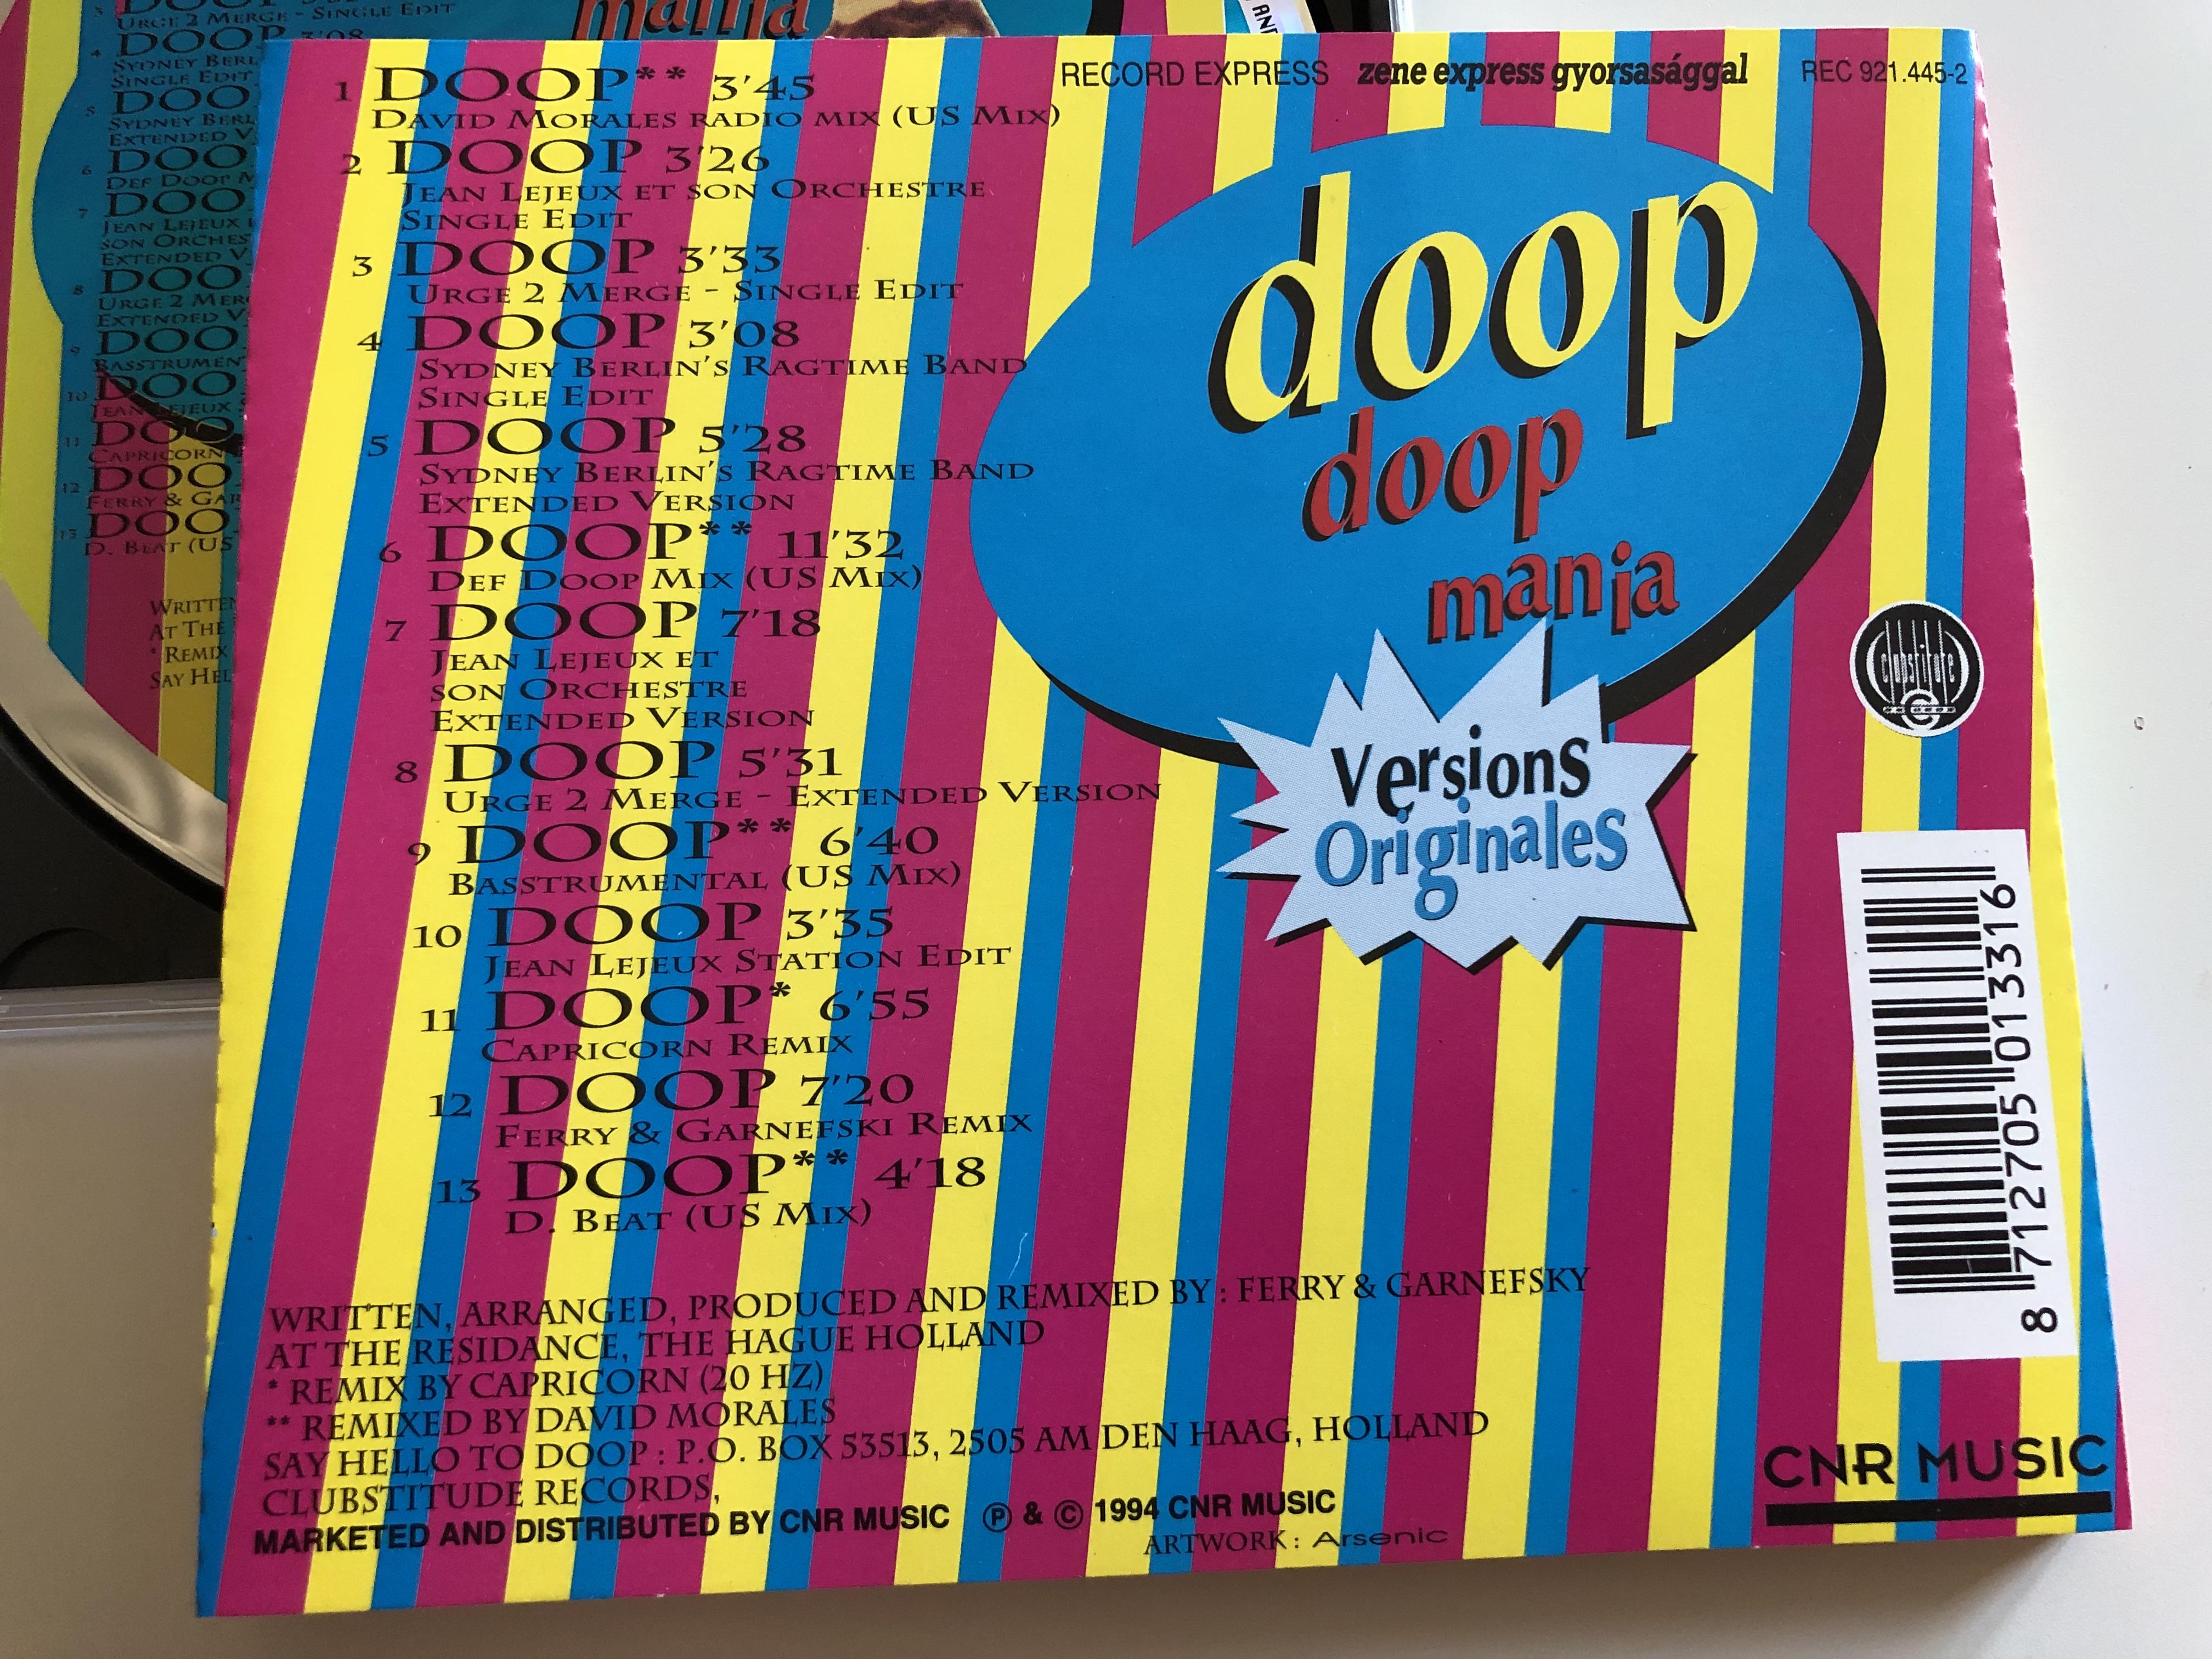 doop-doop-maniaimg-4565.jpg